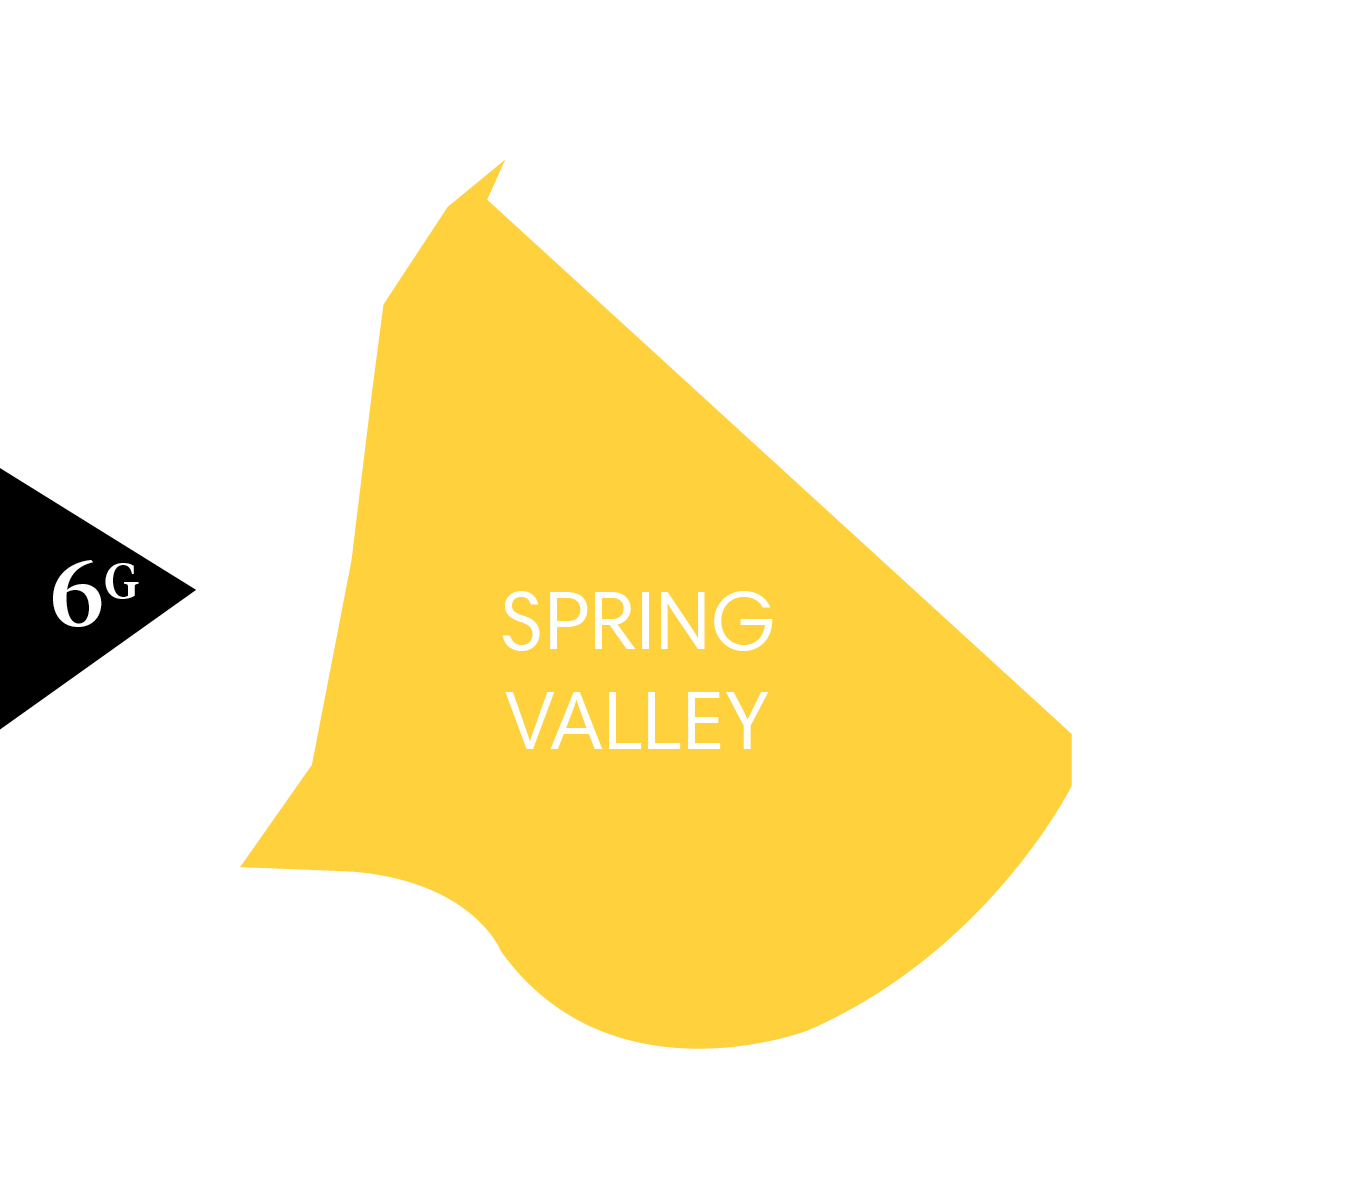 SpringValley.jpg